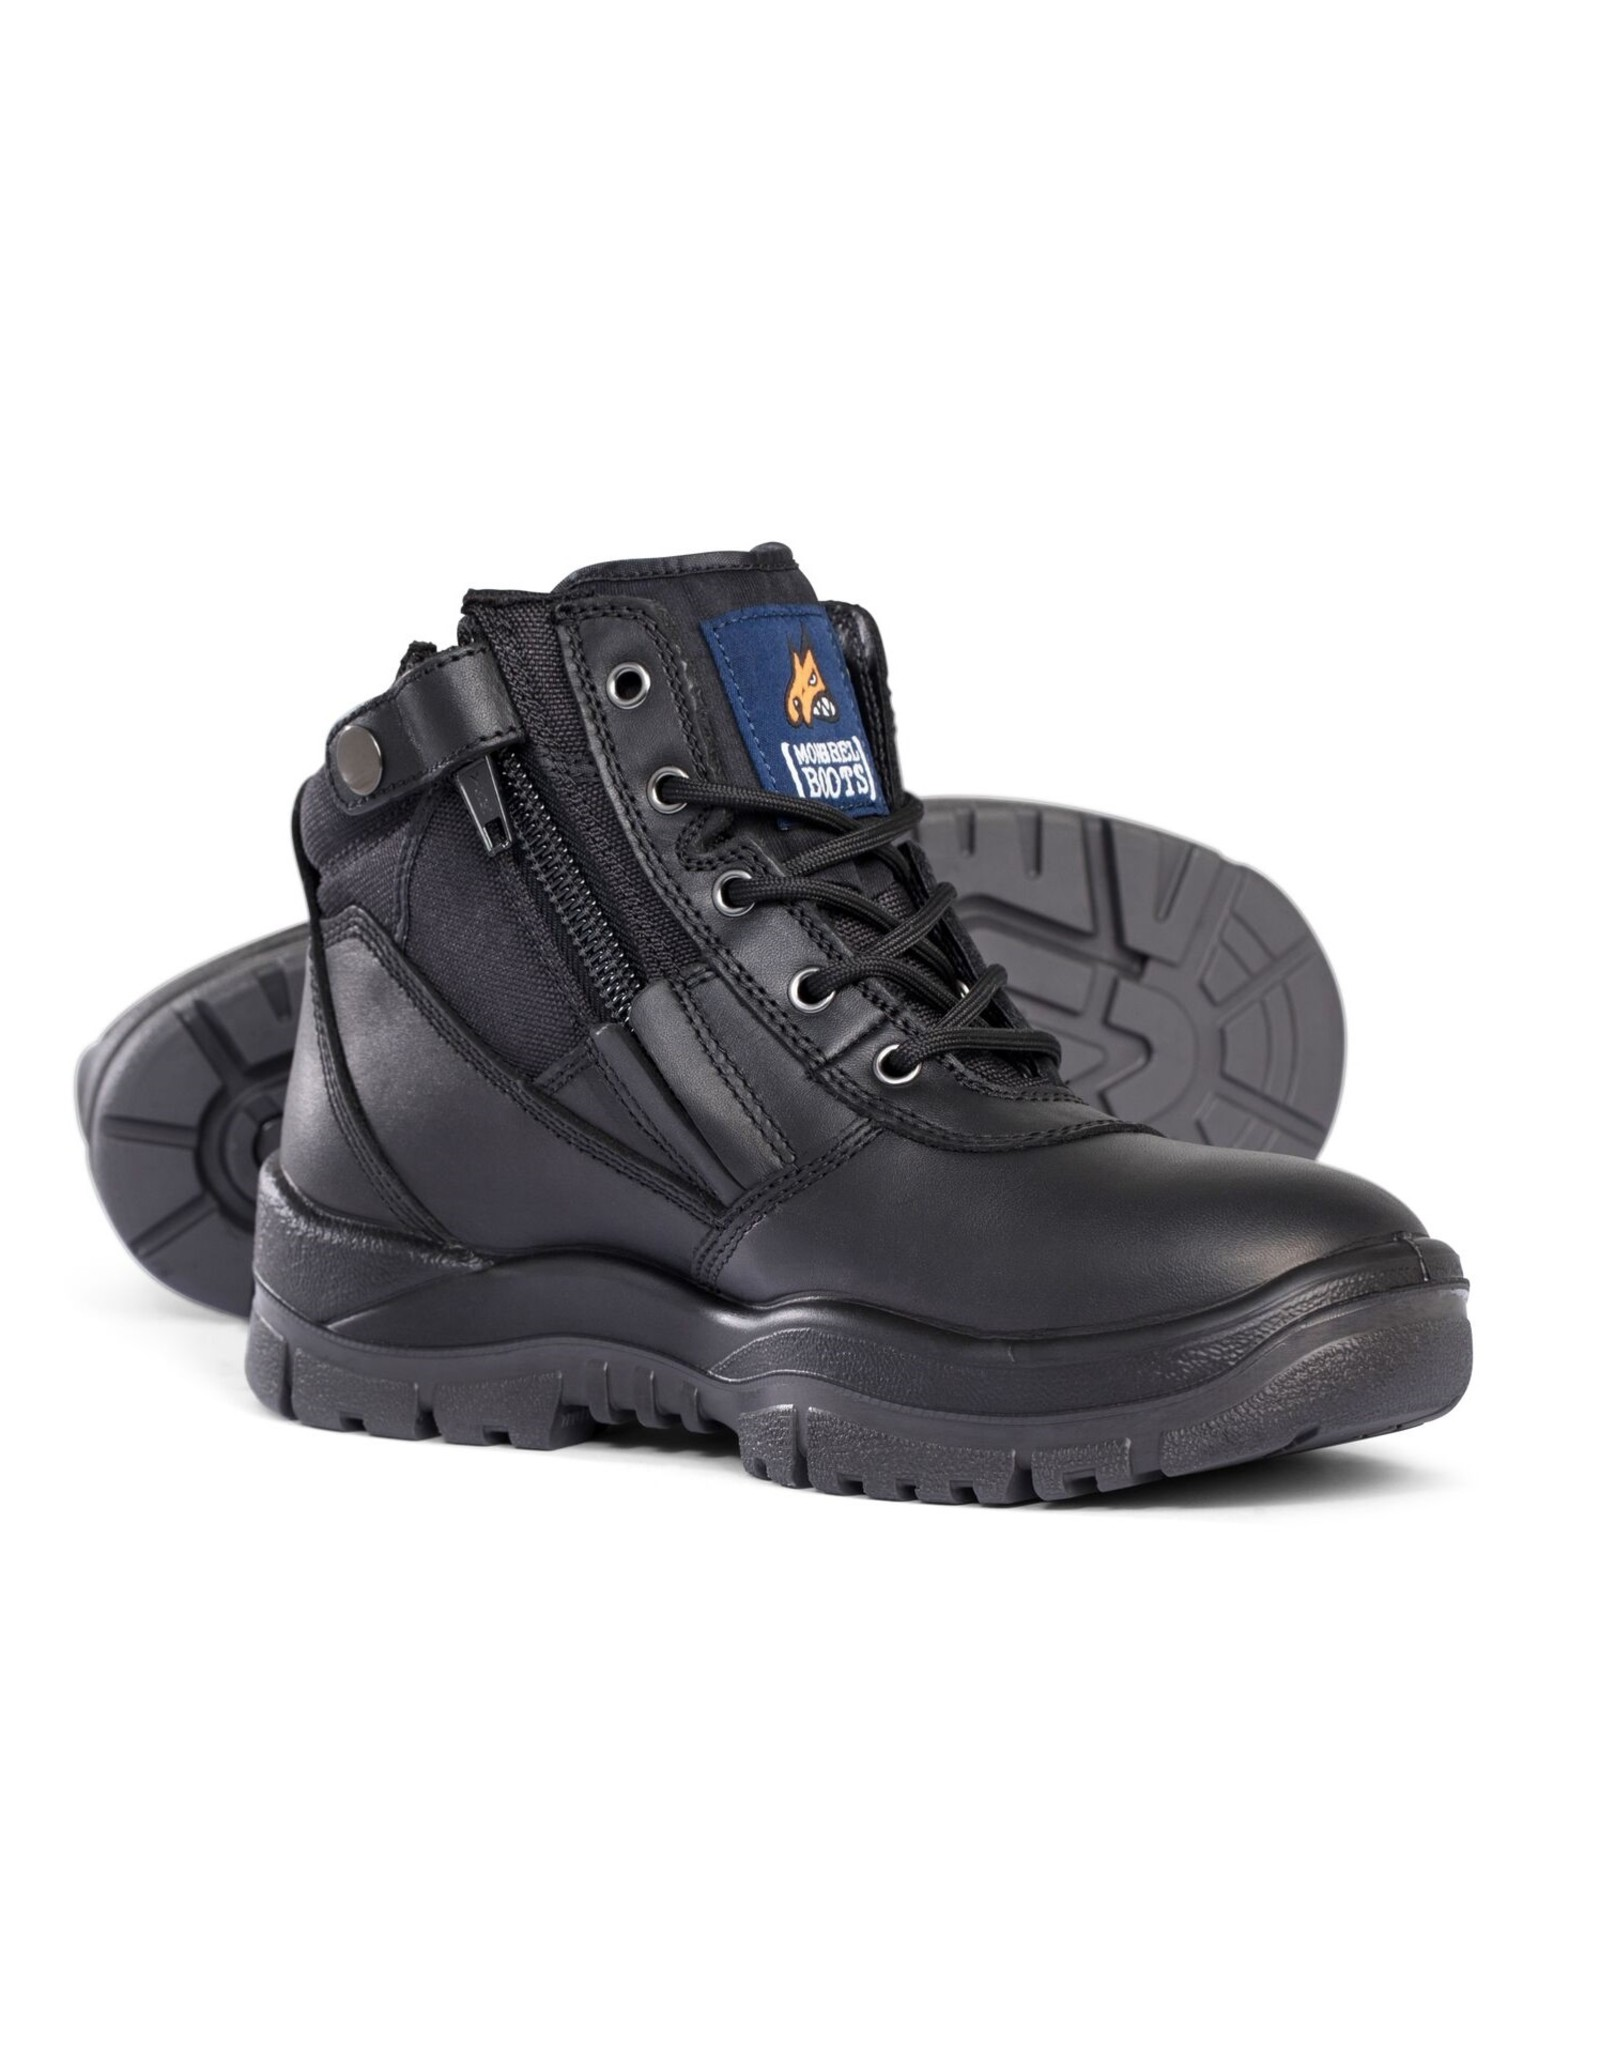 Mongrel Mongrel 'P' Series Zip Sided Black Steel Cap Boot